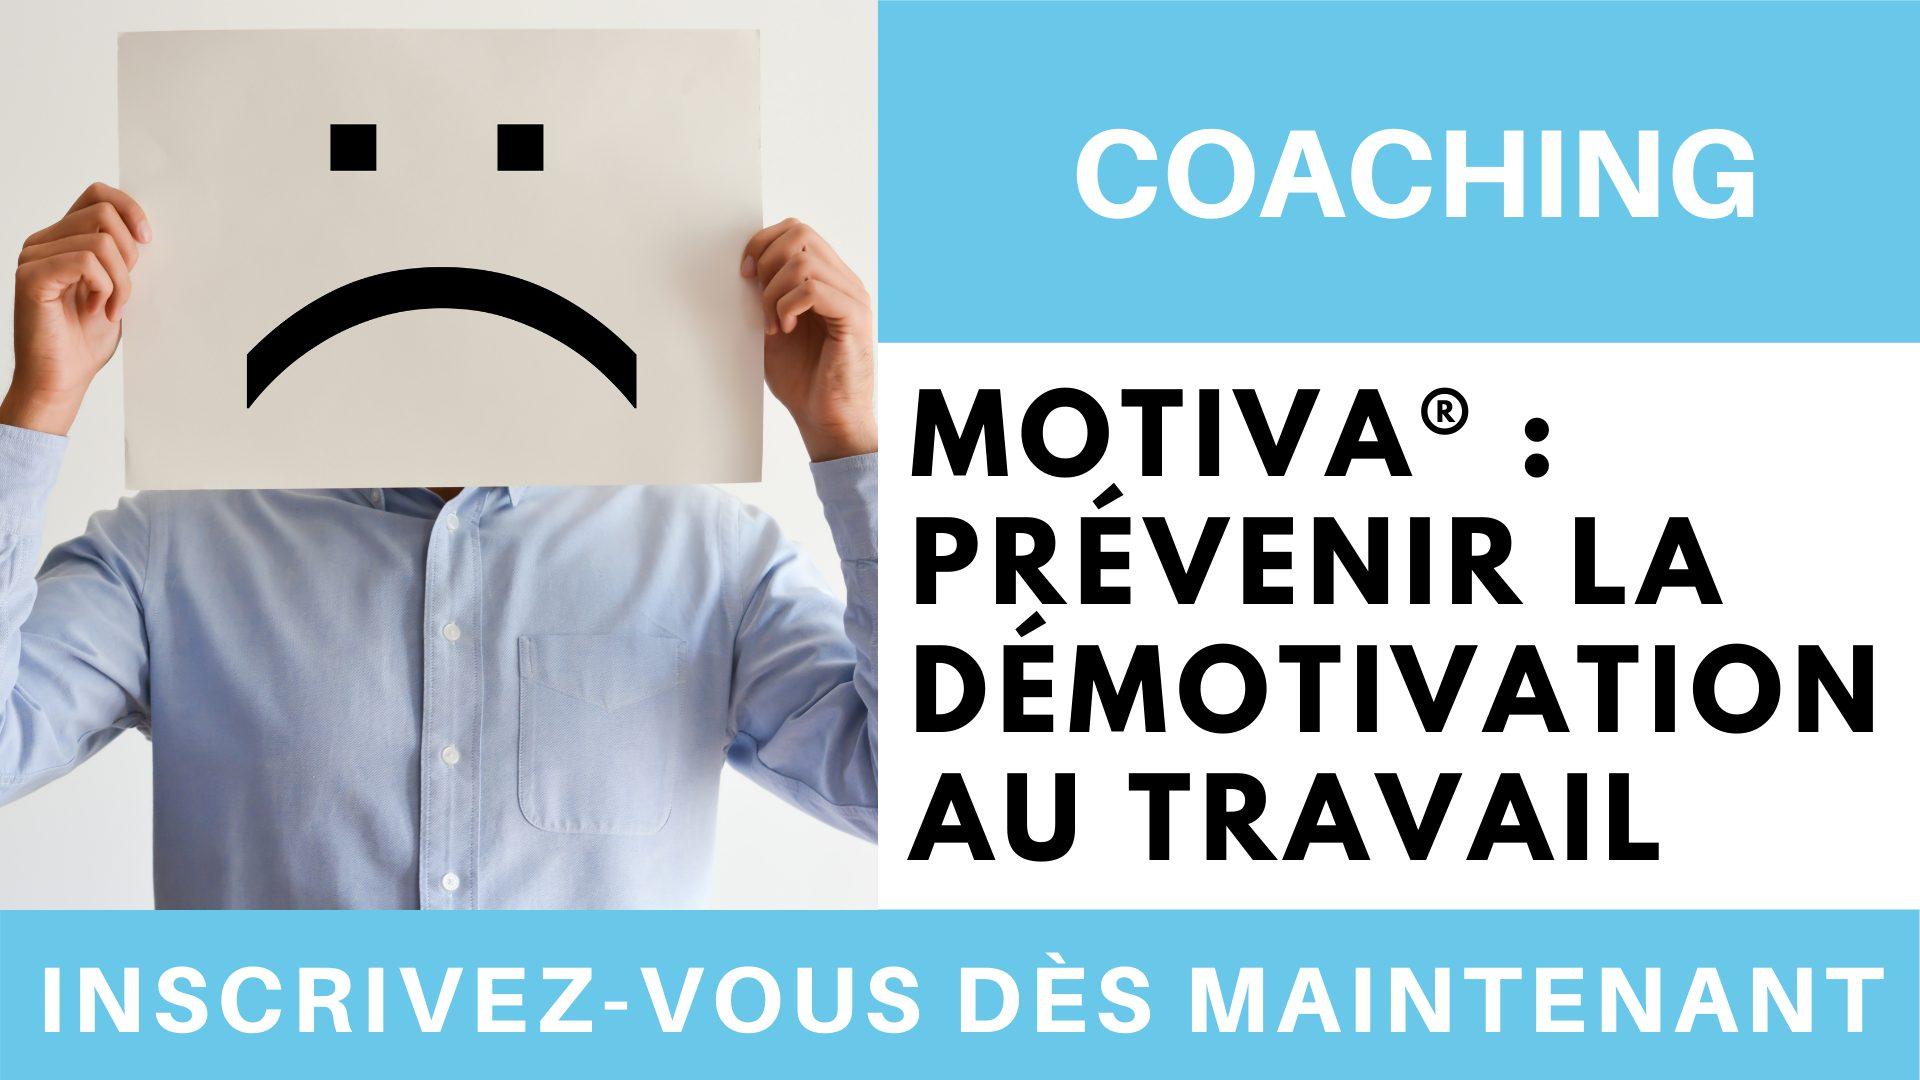 MOTIVA® _ prévenir la démotivation au travail